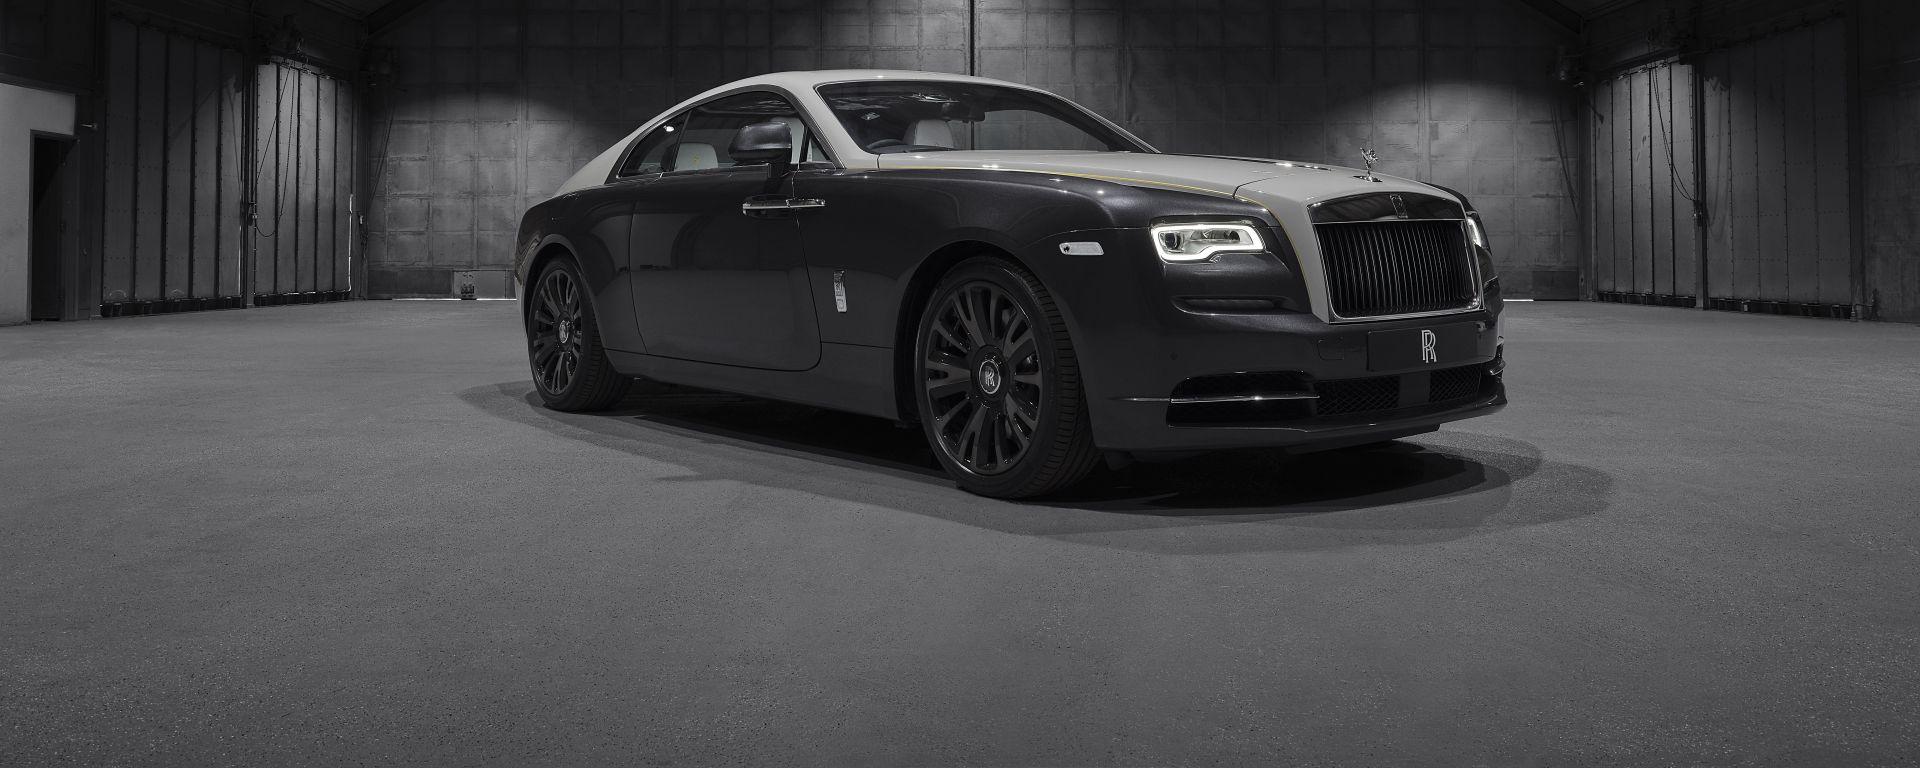 Rolls-Royce Wraith Eagle VIII: vista 3/4 anteriore